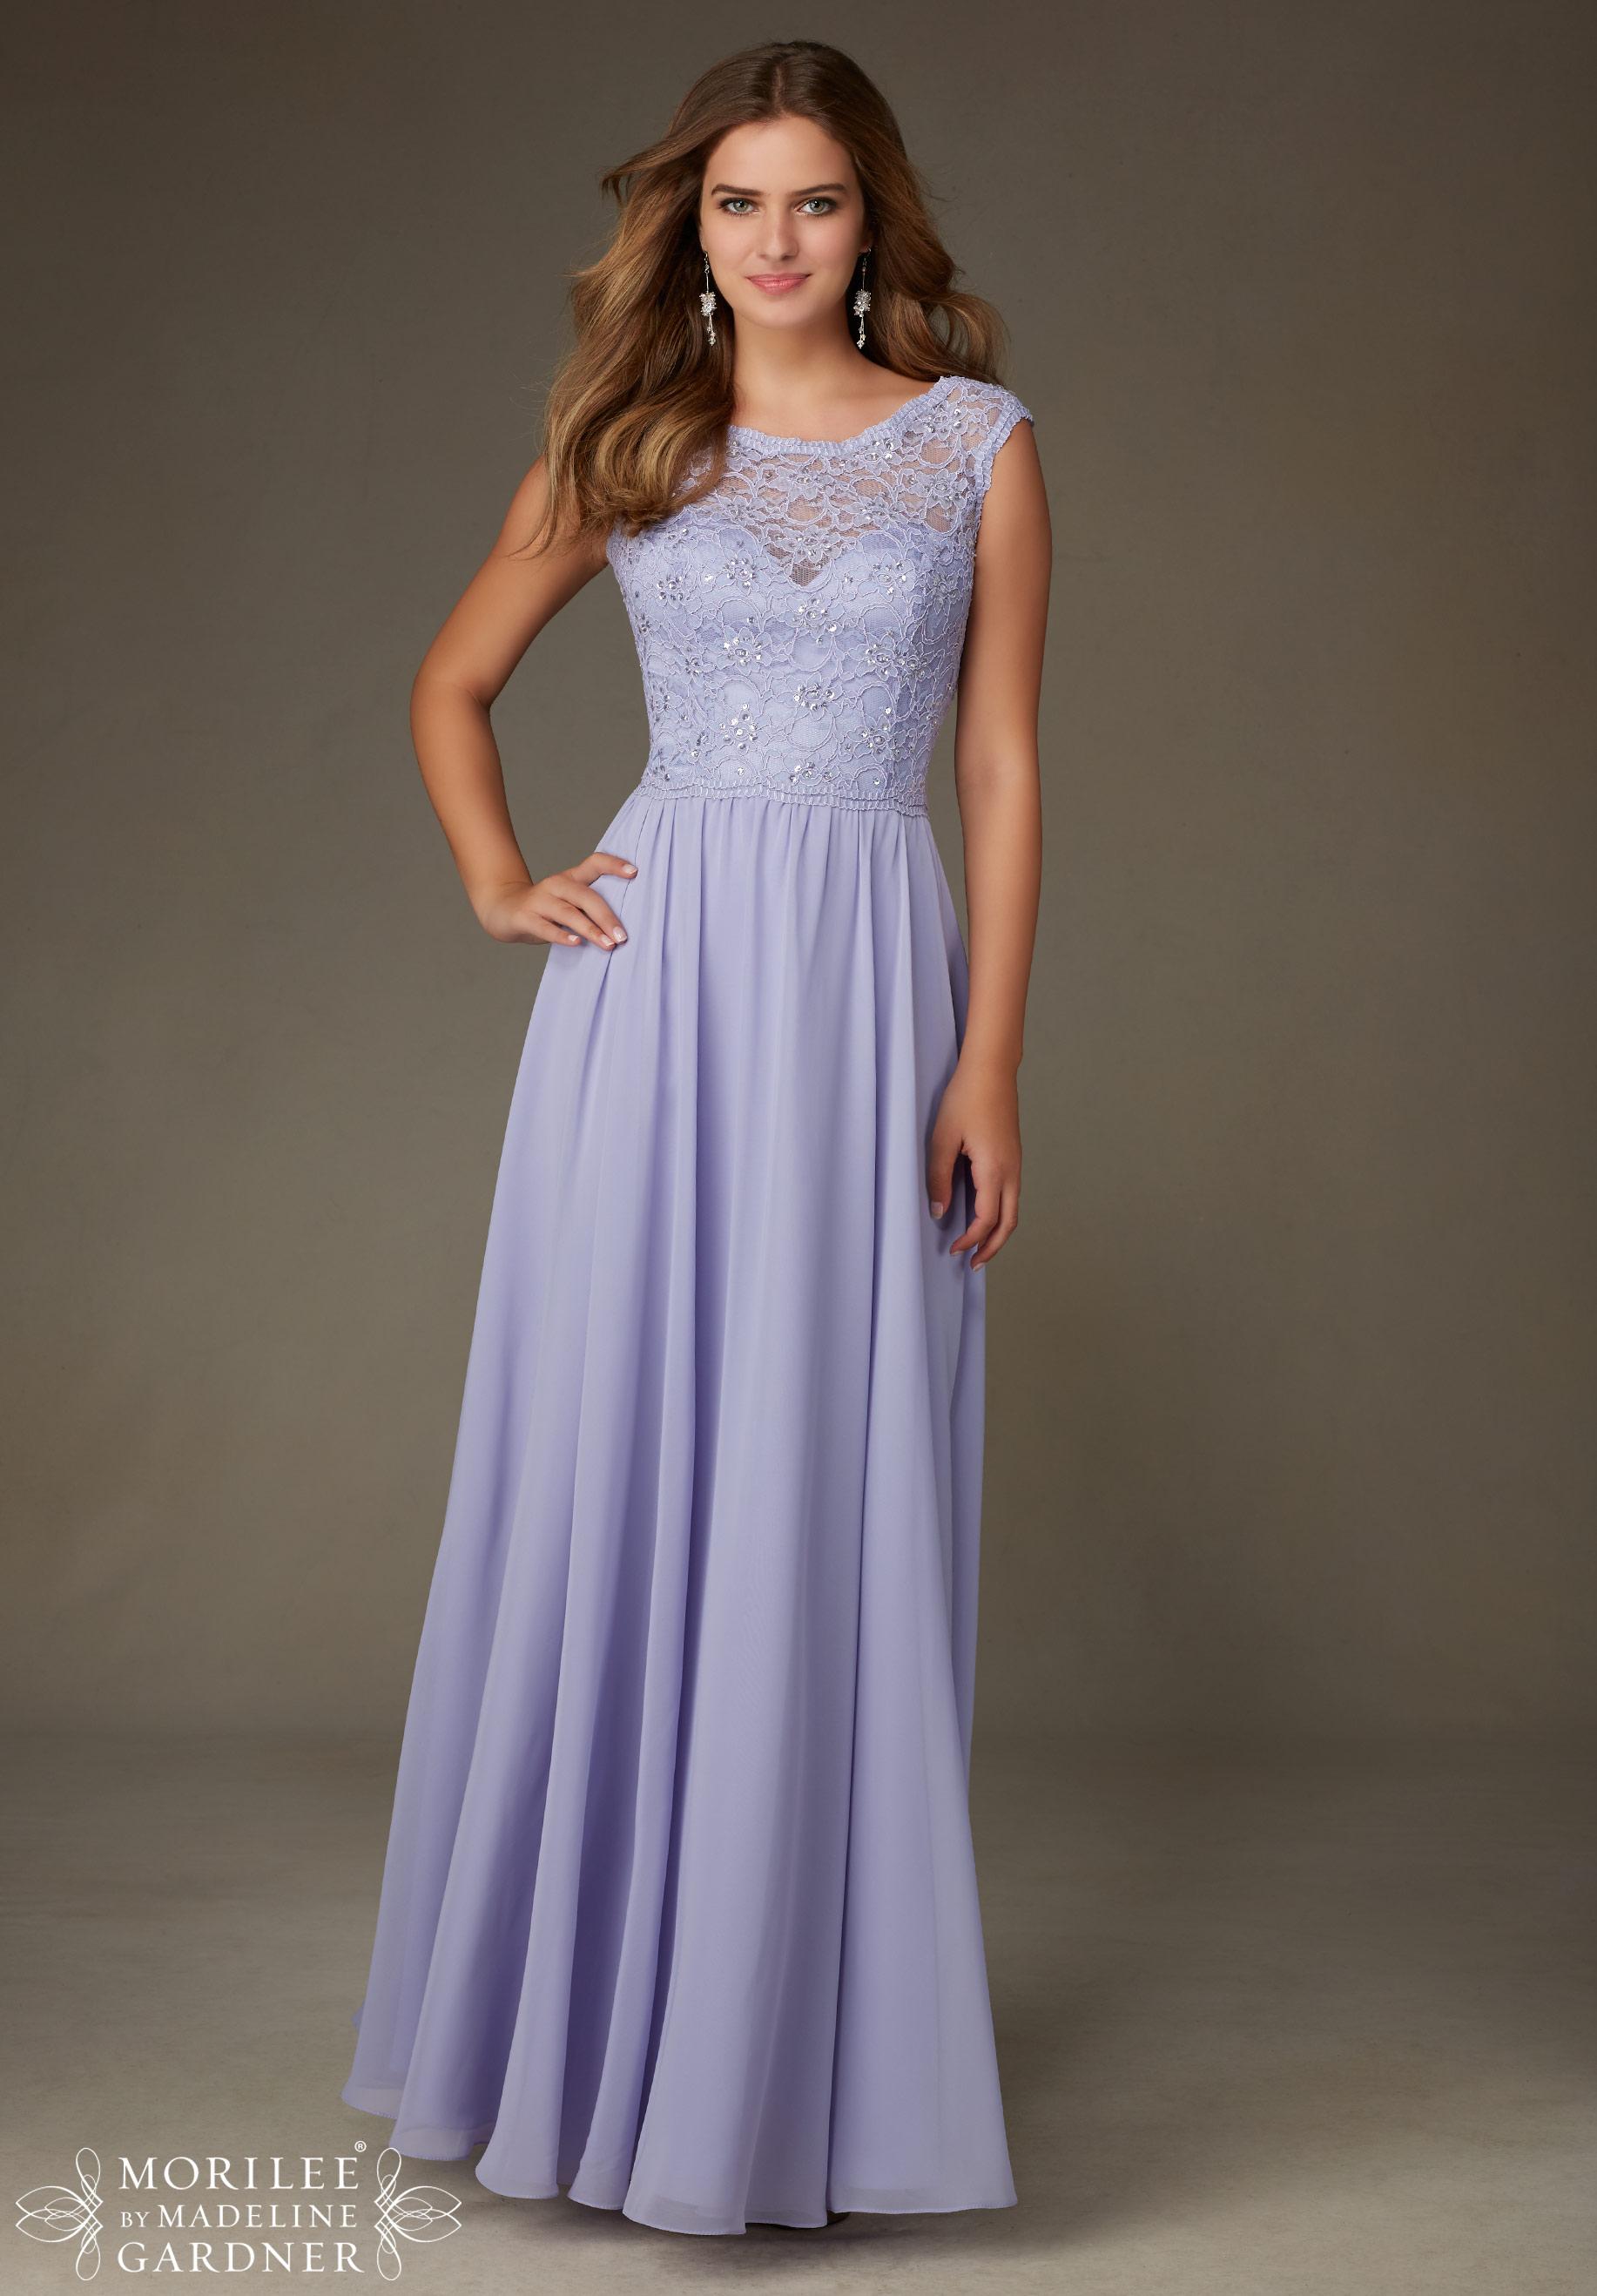 Bridal store bridesmaid dresses mori lee bridesmaids dresses style 125